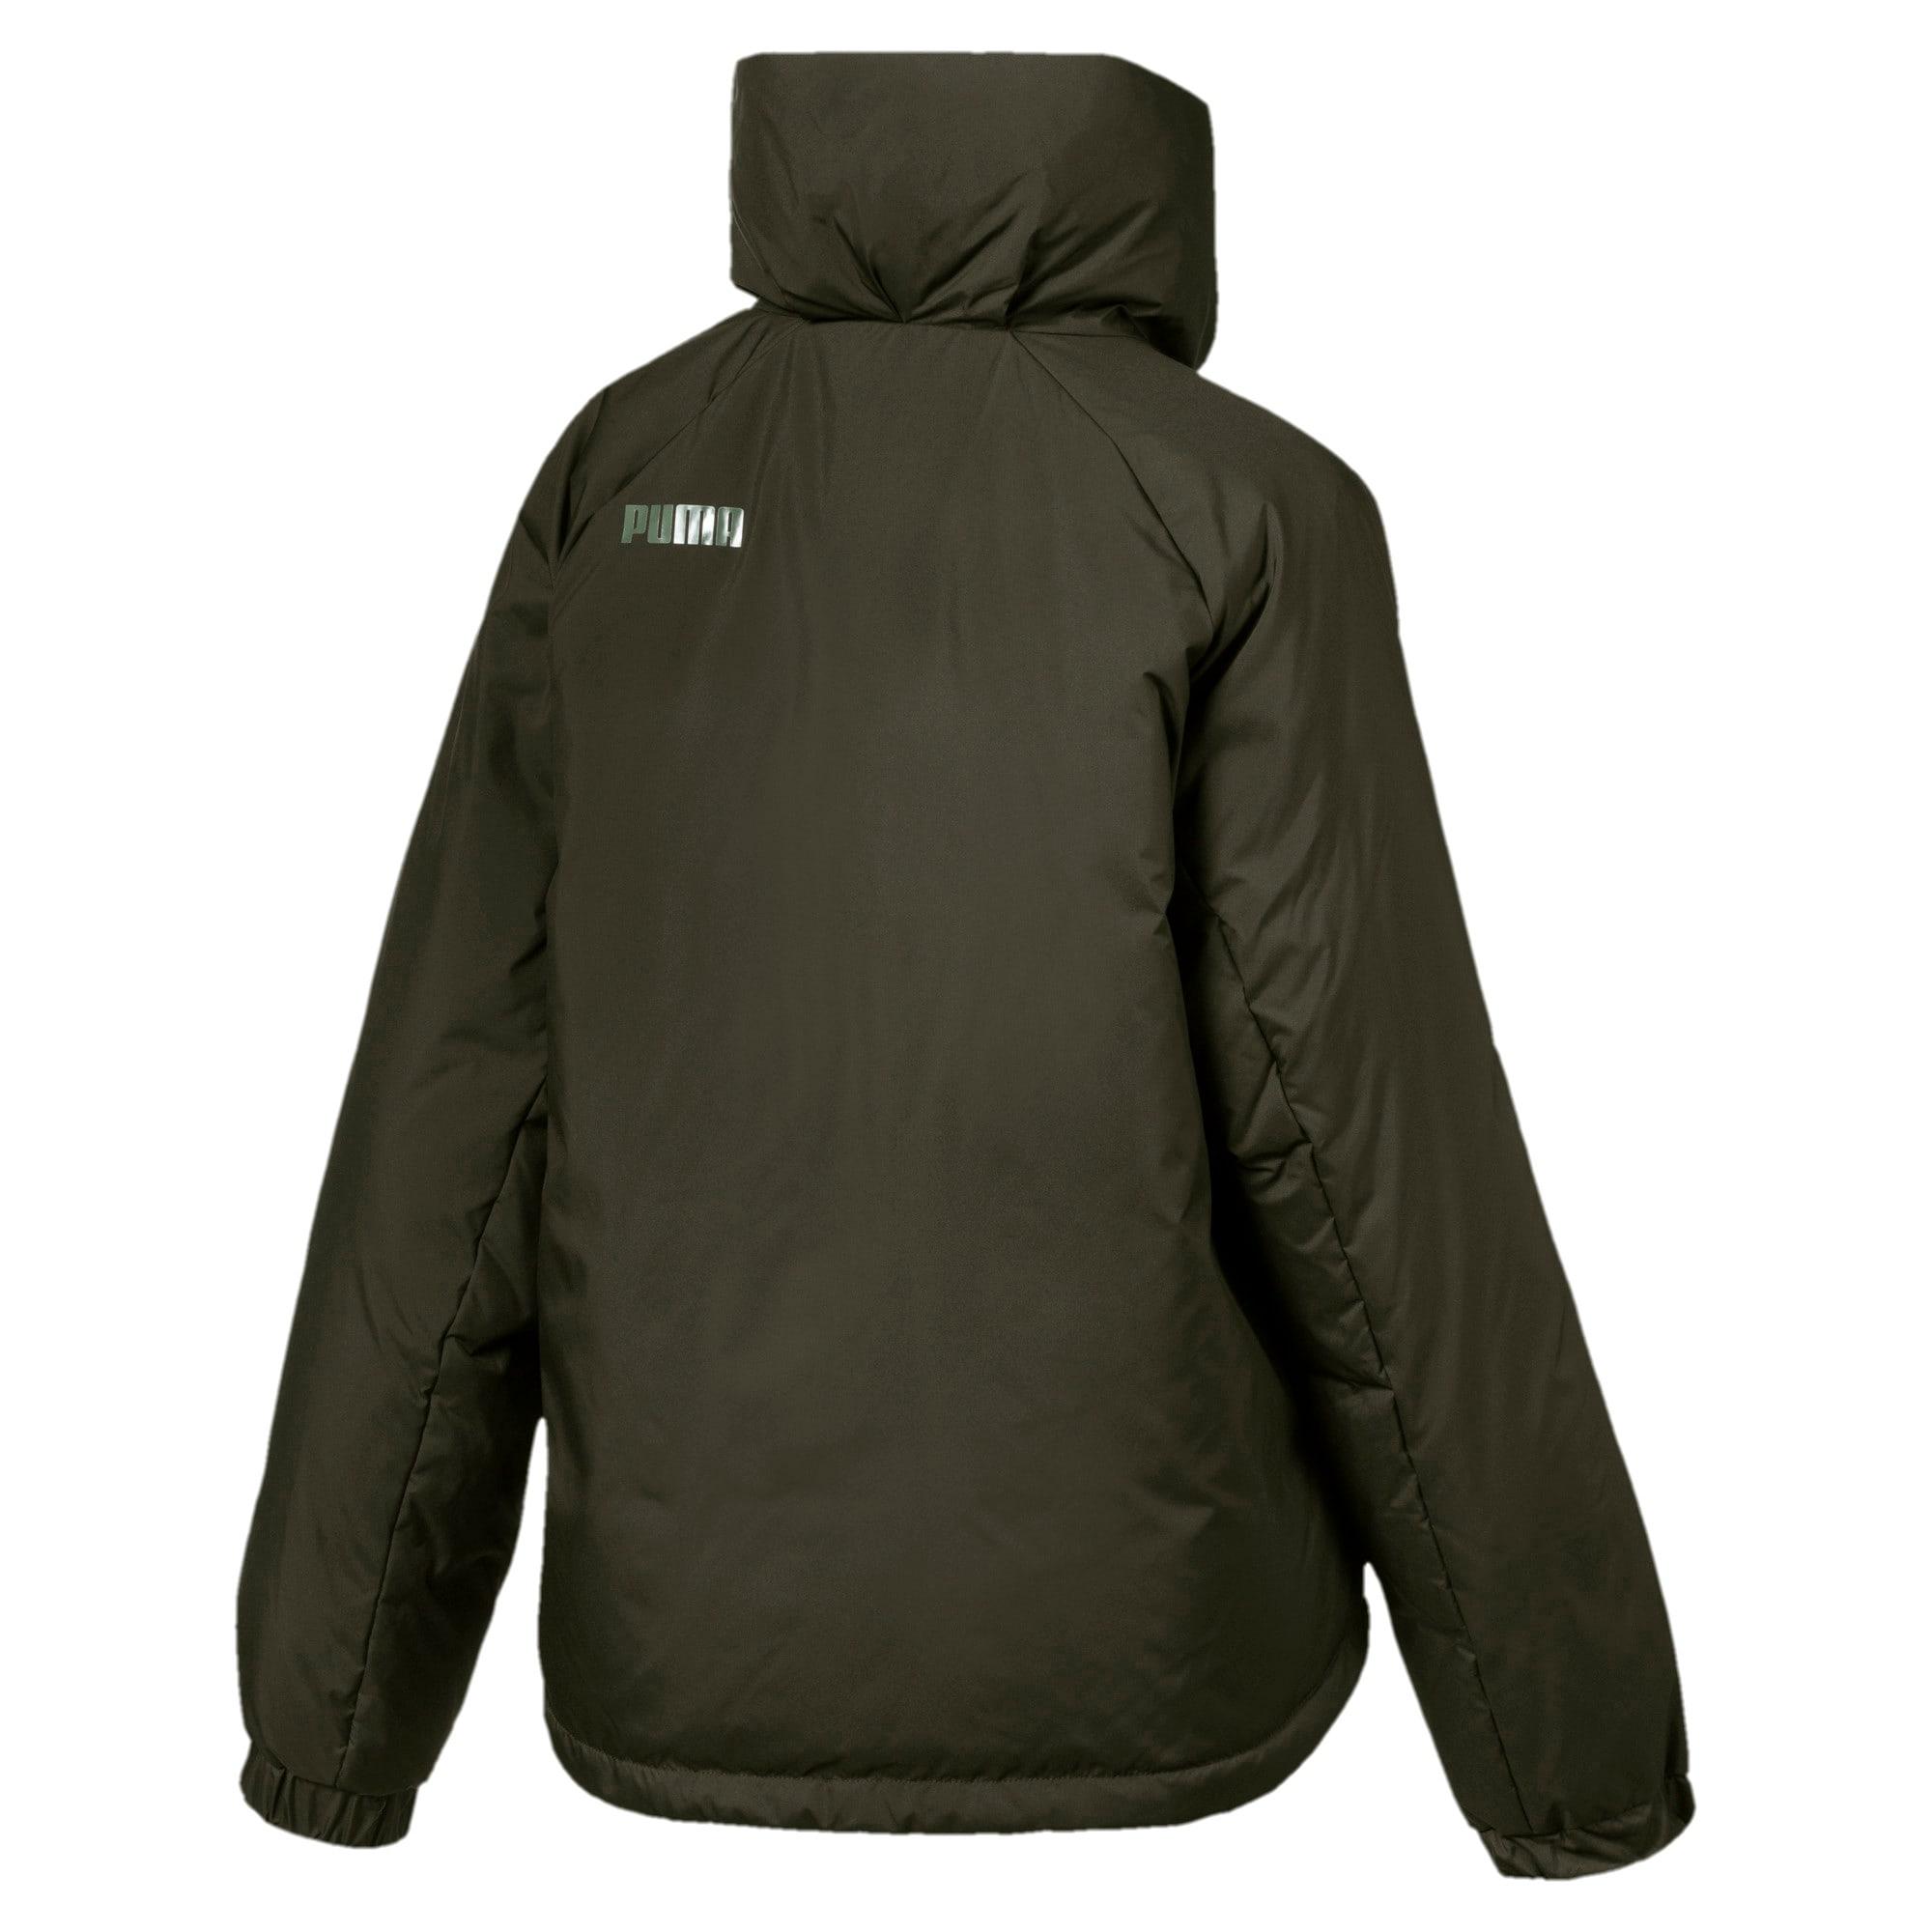 Thumbnail 3 of 480 Down Women's Jacket, Forest Night, medium